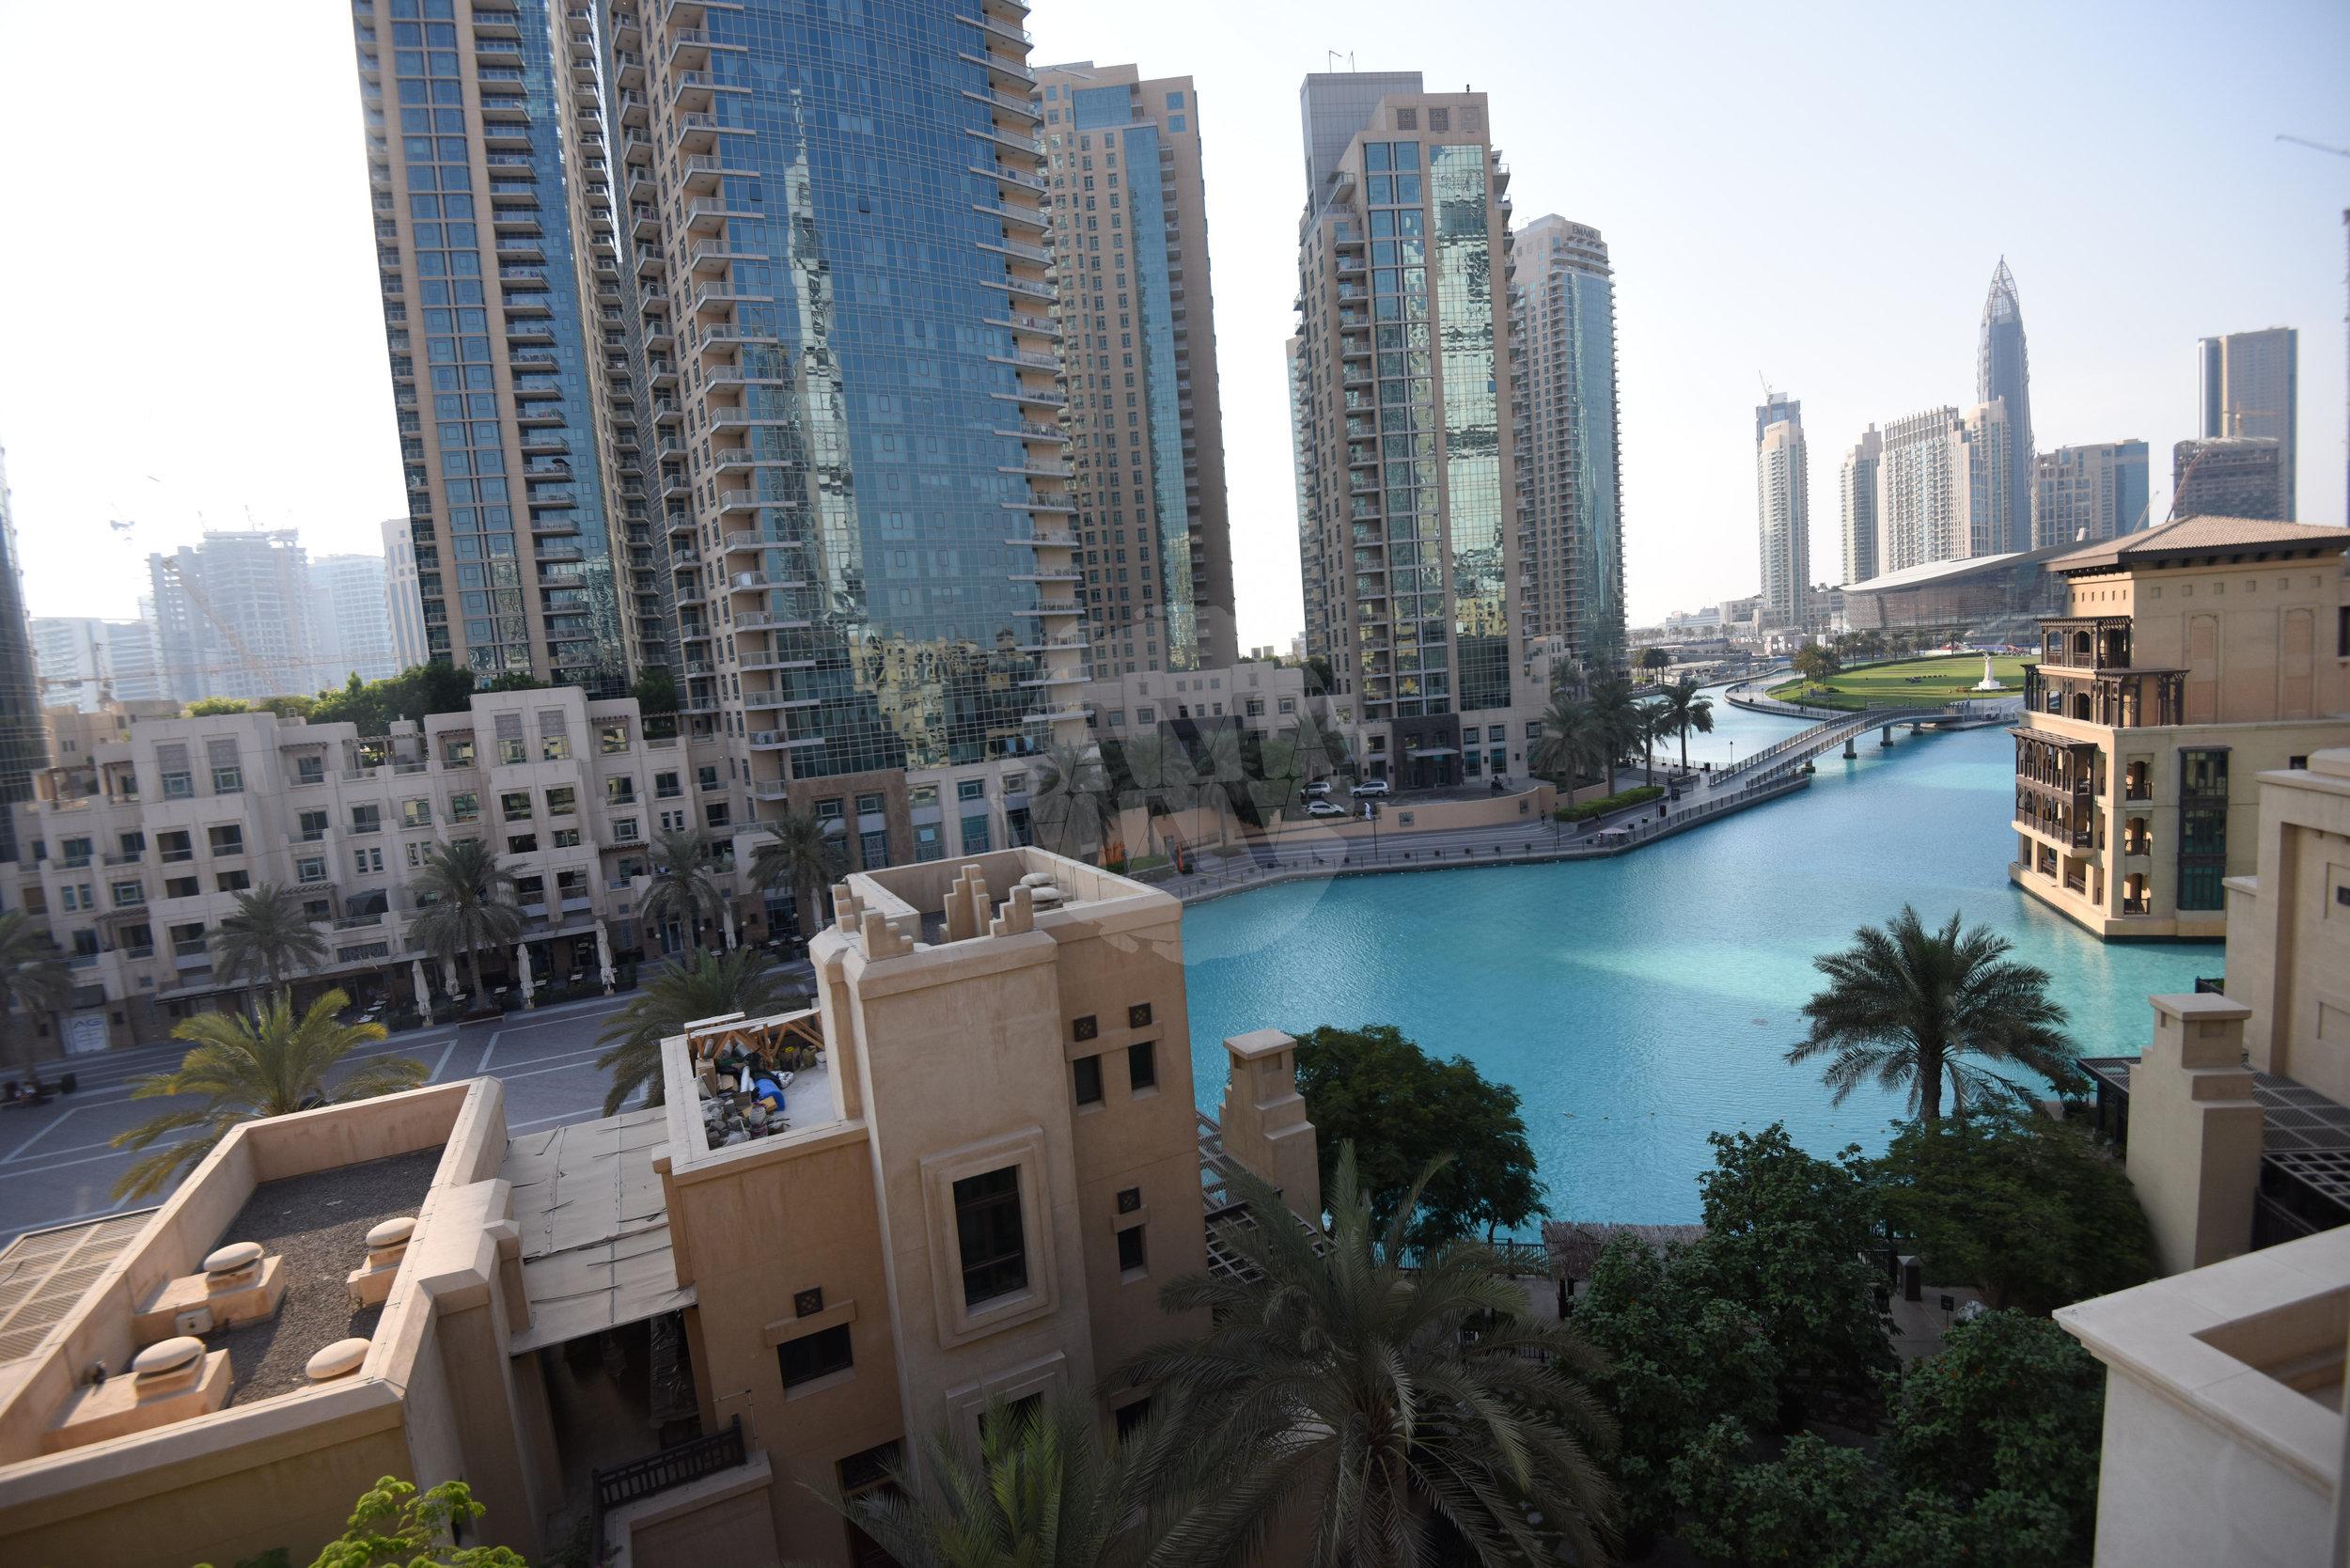 The balcony offers stunning views of Burj Plaza and overlooks Burj Park